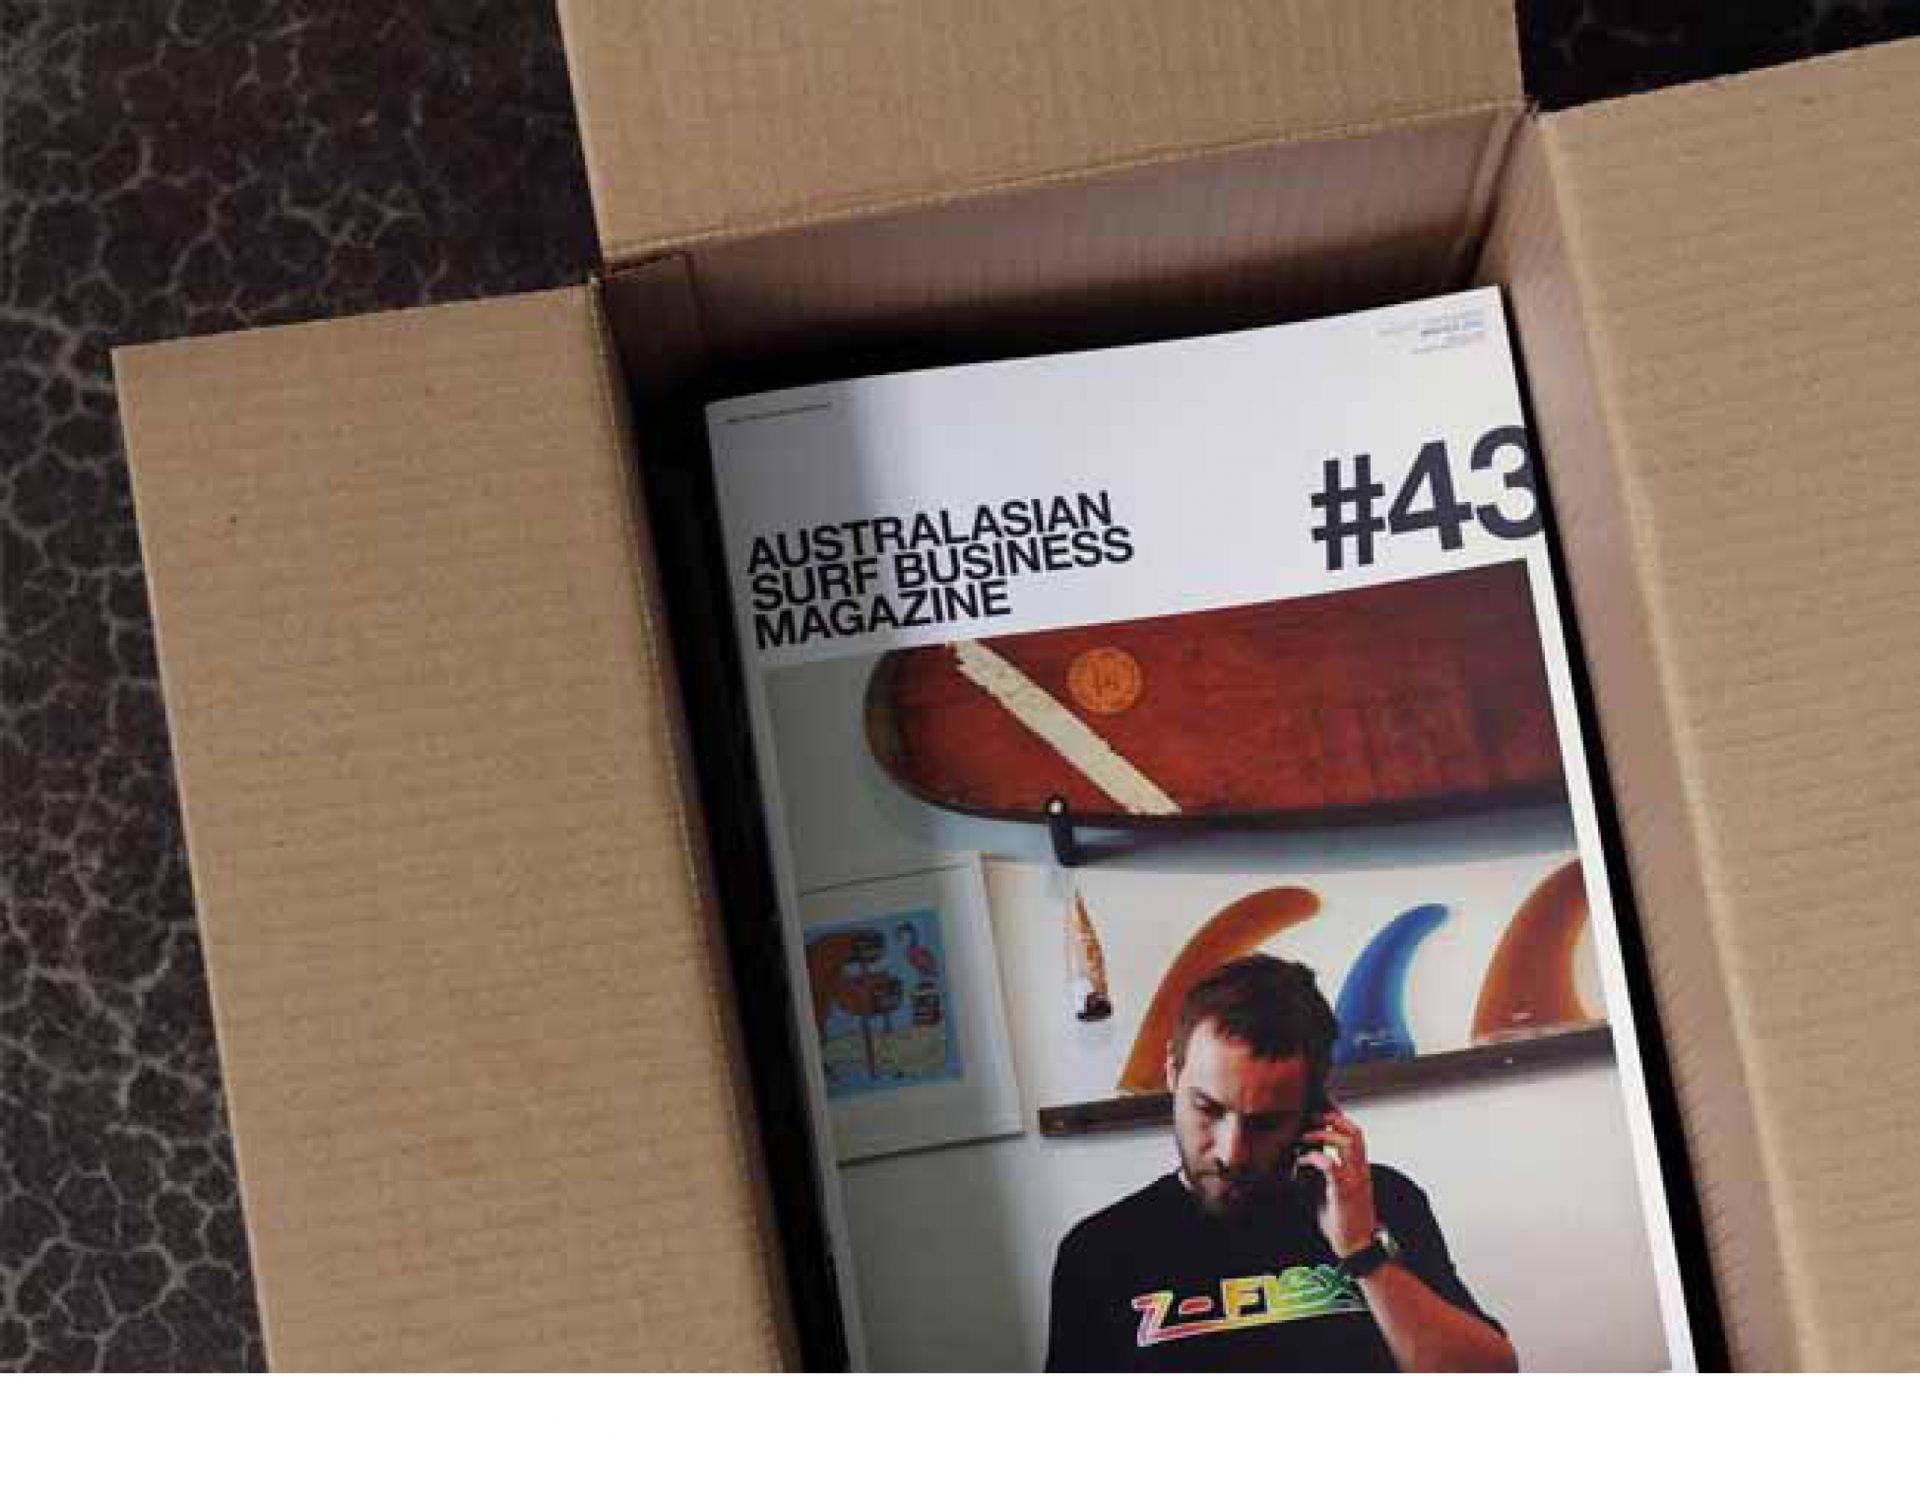 About ASB Magazine - ASB